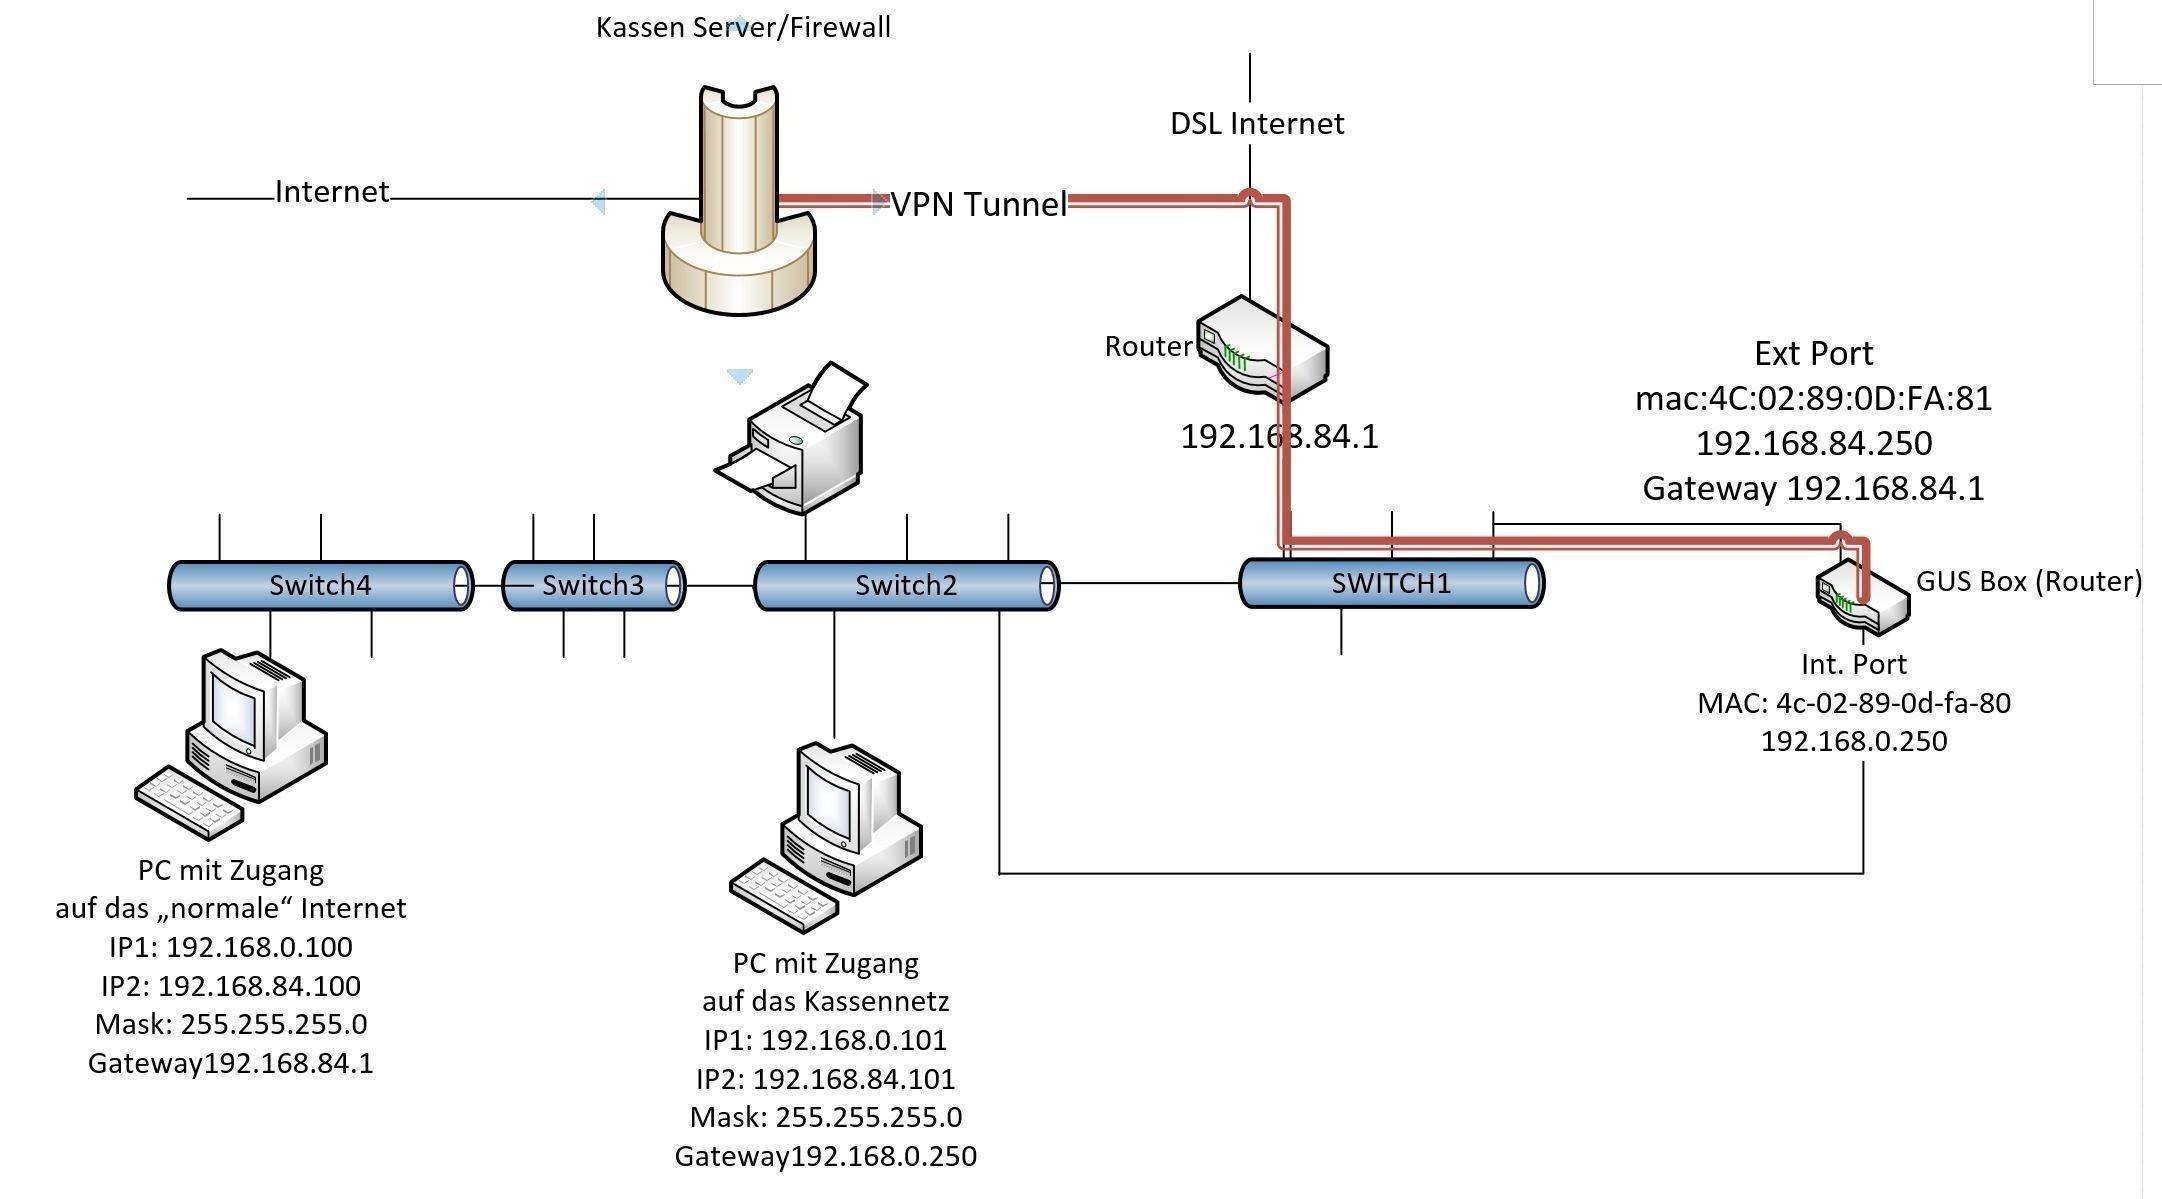 Car Window Diagram Wiring Diagram Ne595r0 – Wire Diagram Of Car Window Diagram